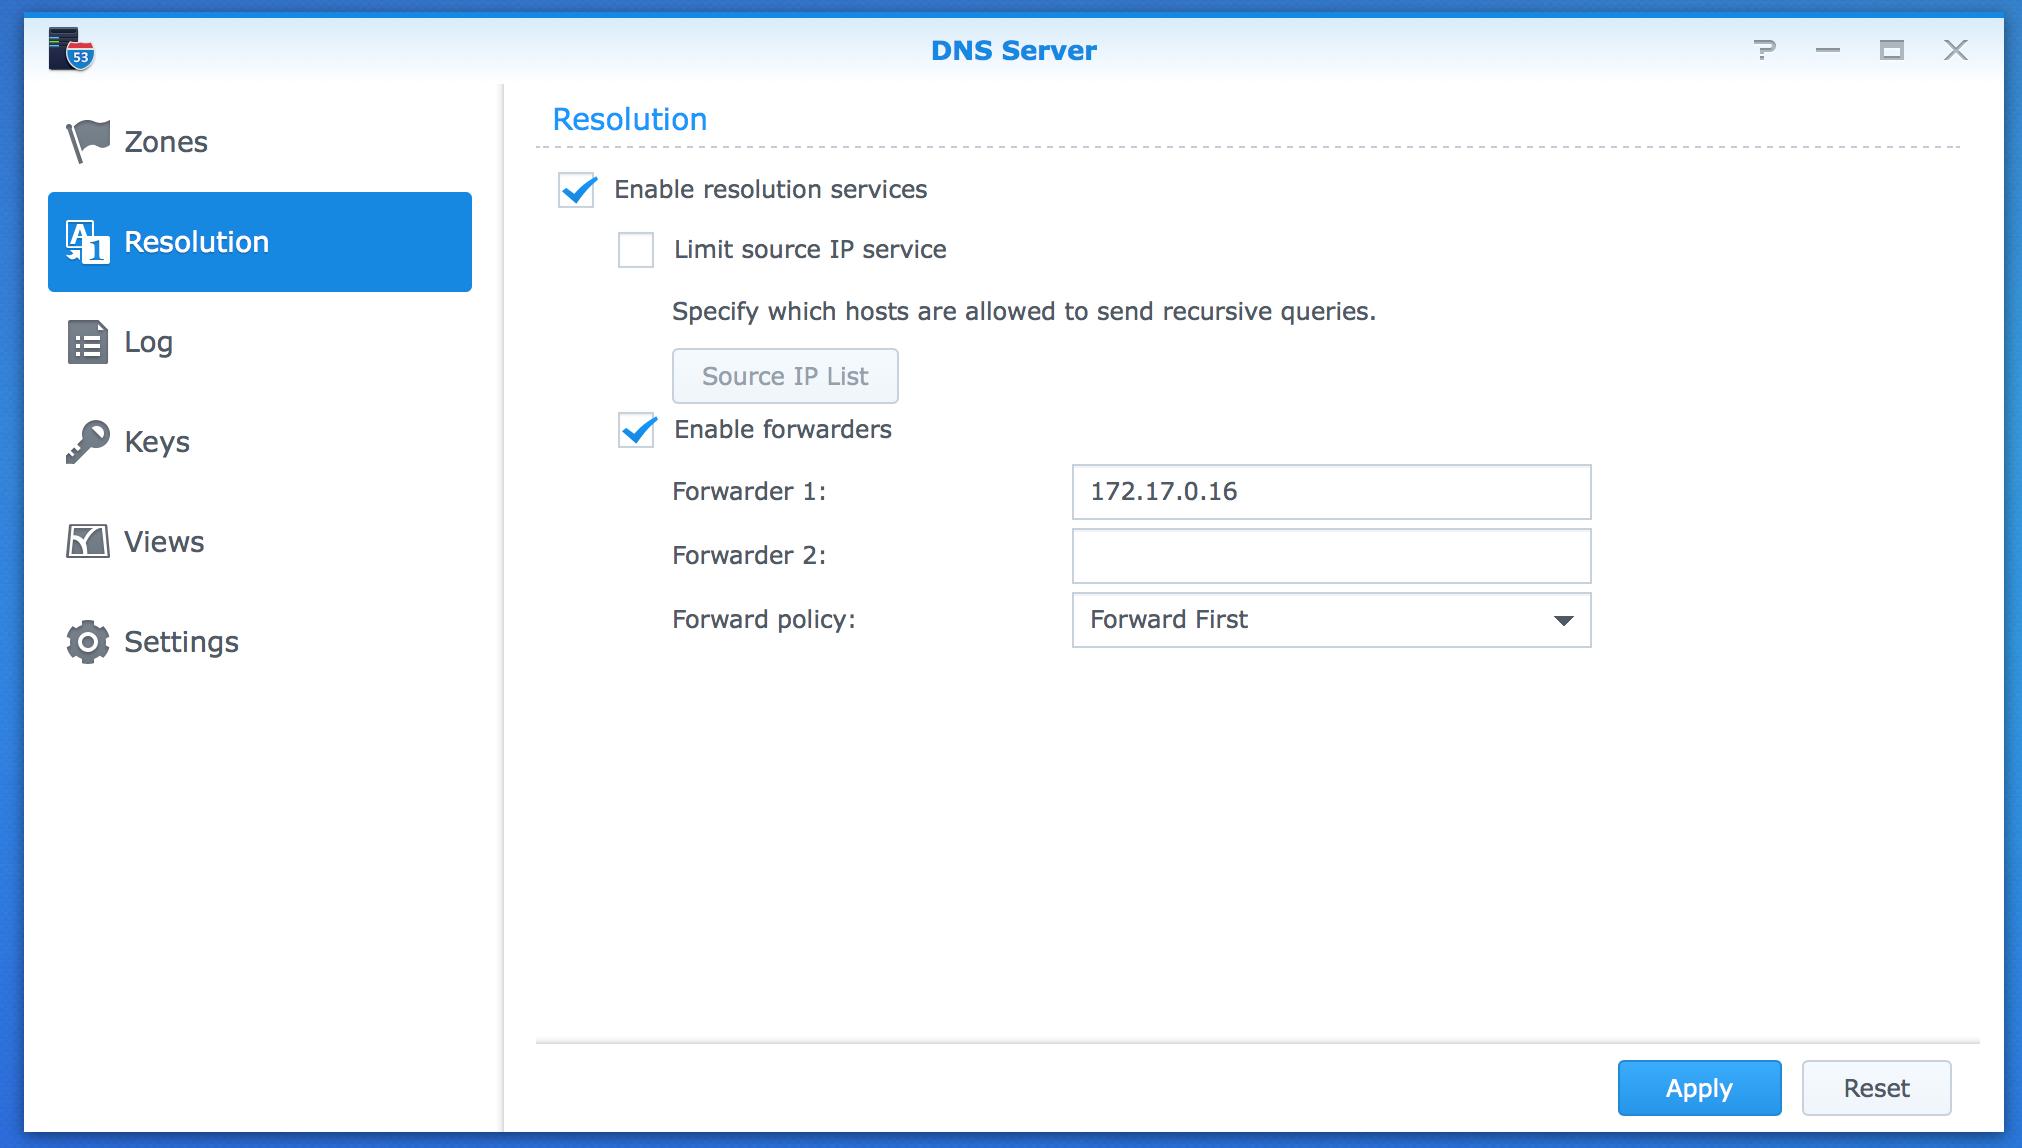 Running Pi-hole on Synology alongside DNS Server